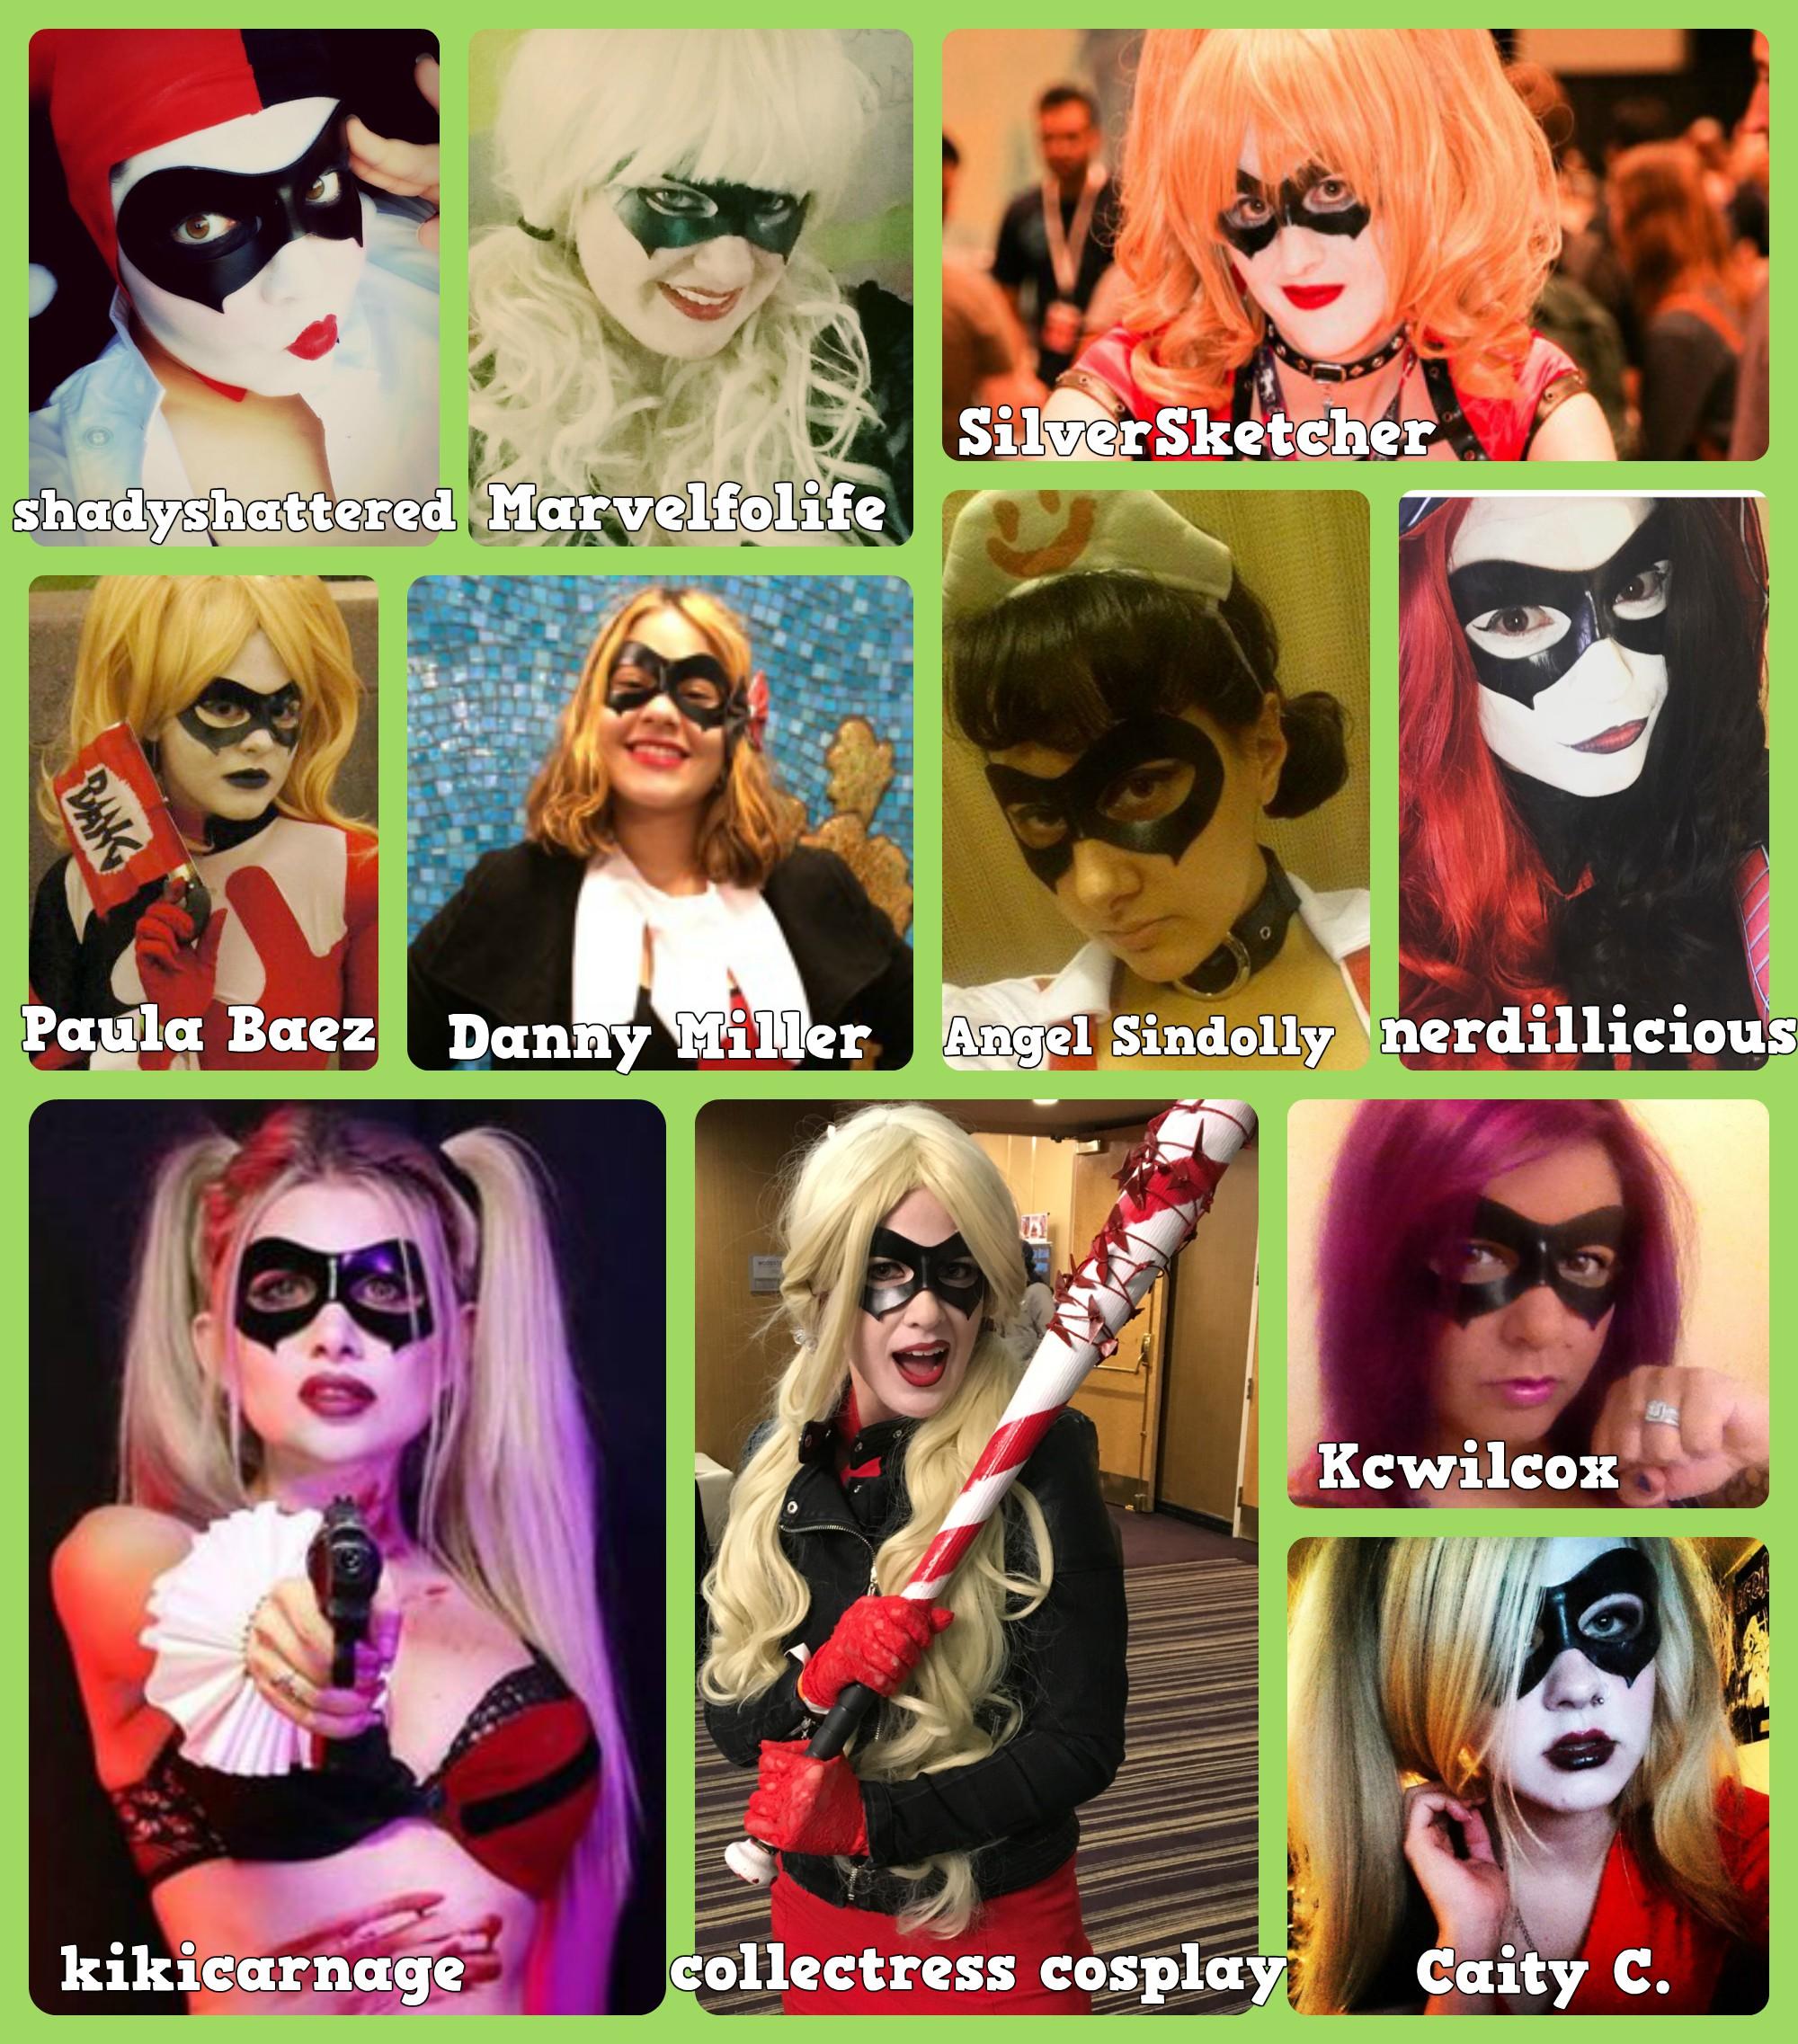 harley-quinn-injustice-mask-collage.jpg